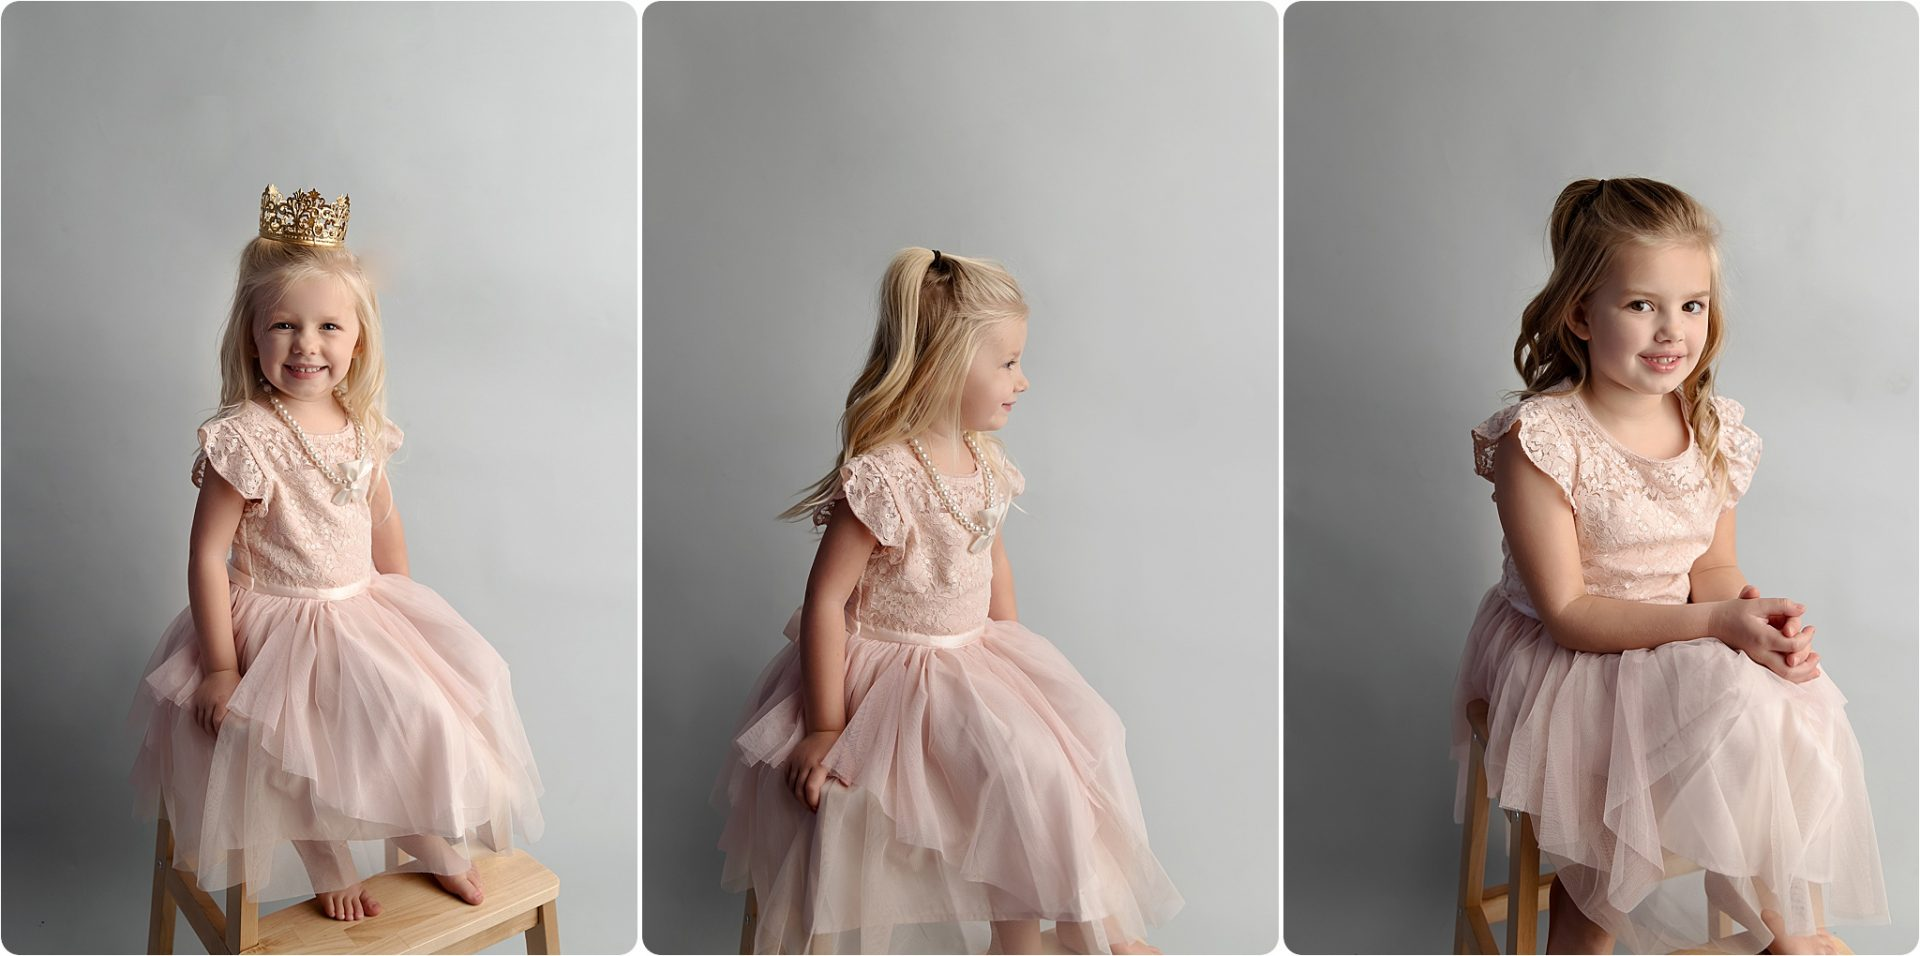 Tucson Child Portrait Studio